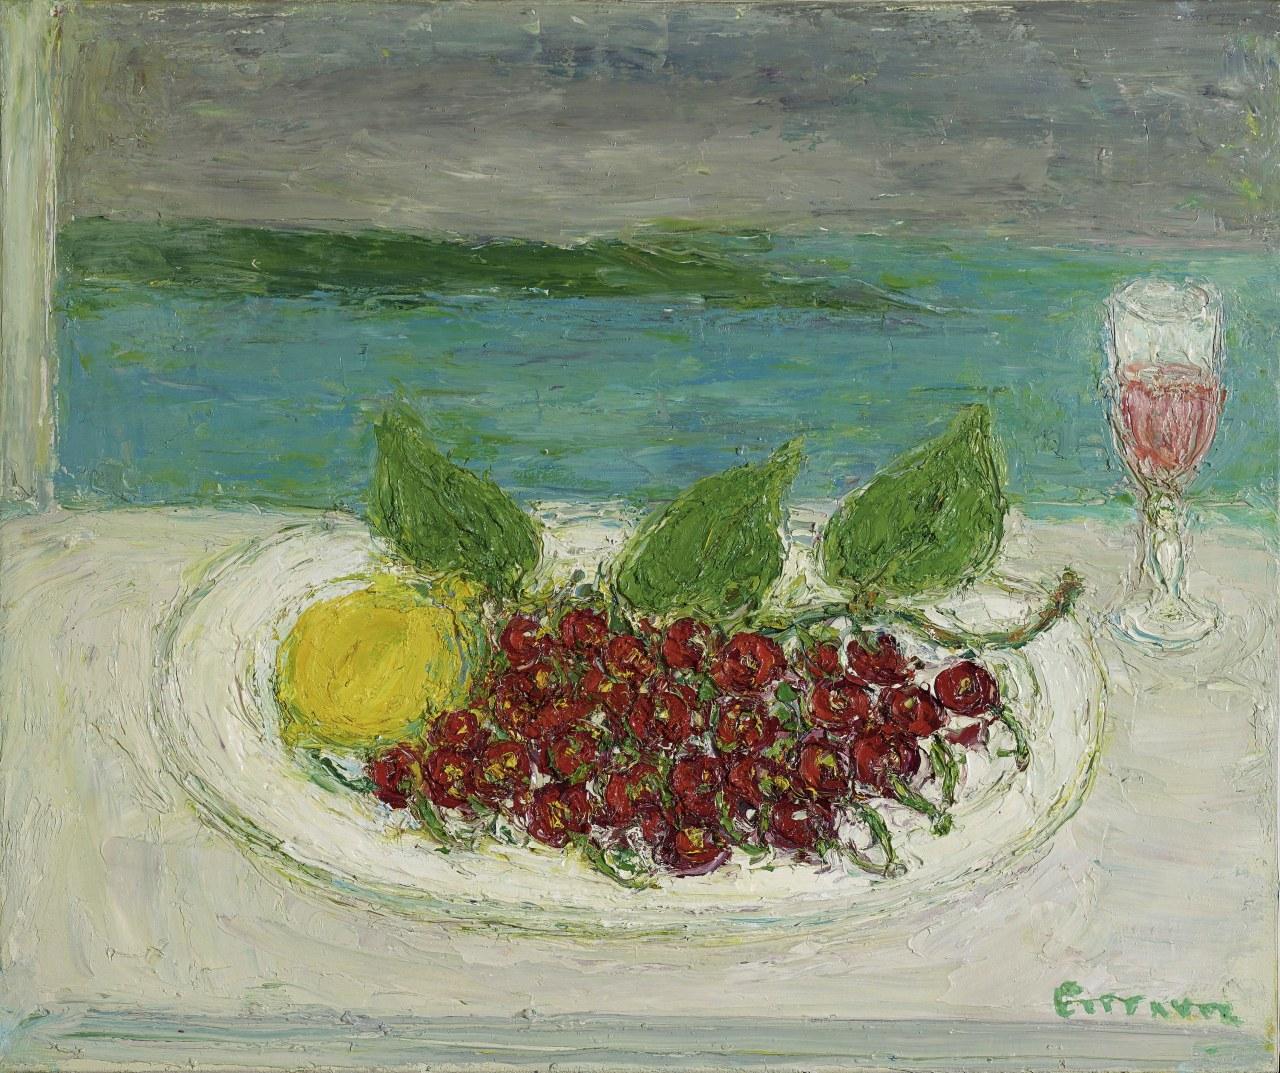 amare-habeo: André Cottavoz (French, 1922-2012)Cherries in front of the sea (Cerises devant la mer), N/ROil on cnavas,46 x 55 cm